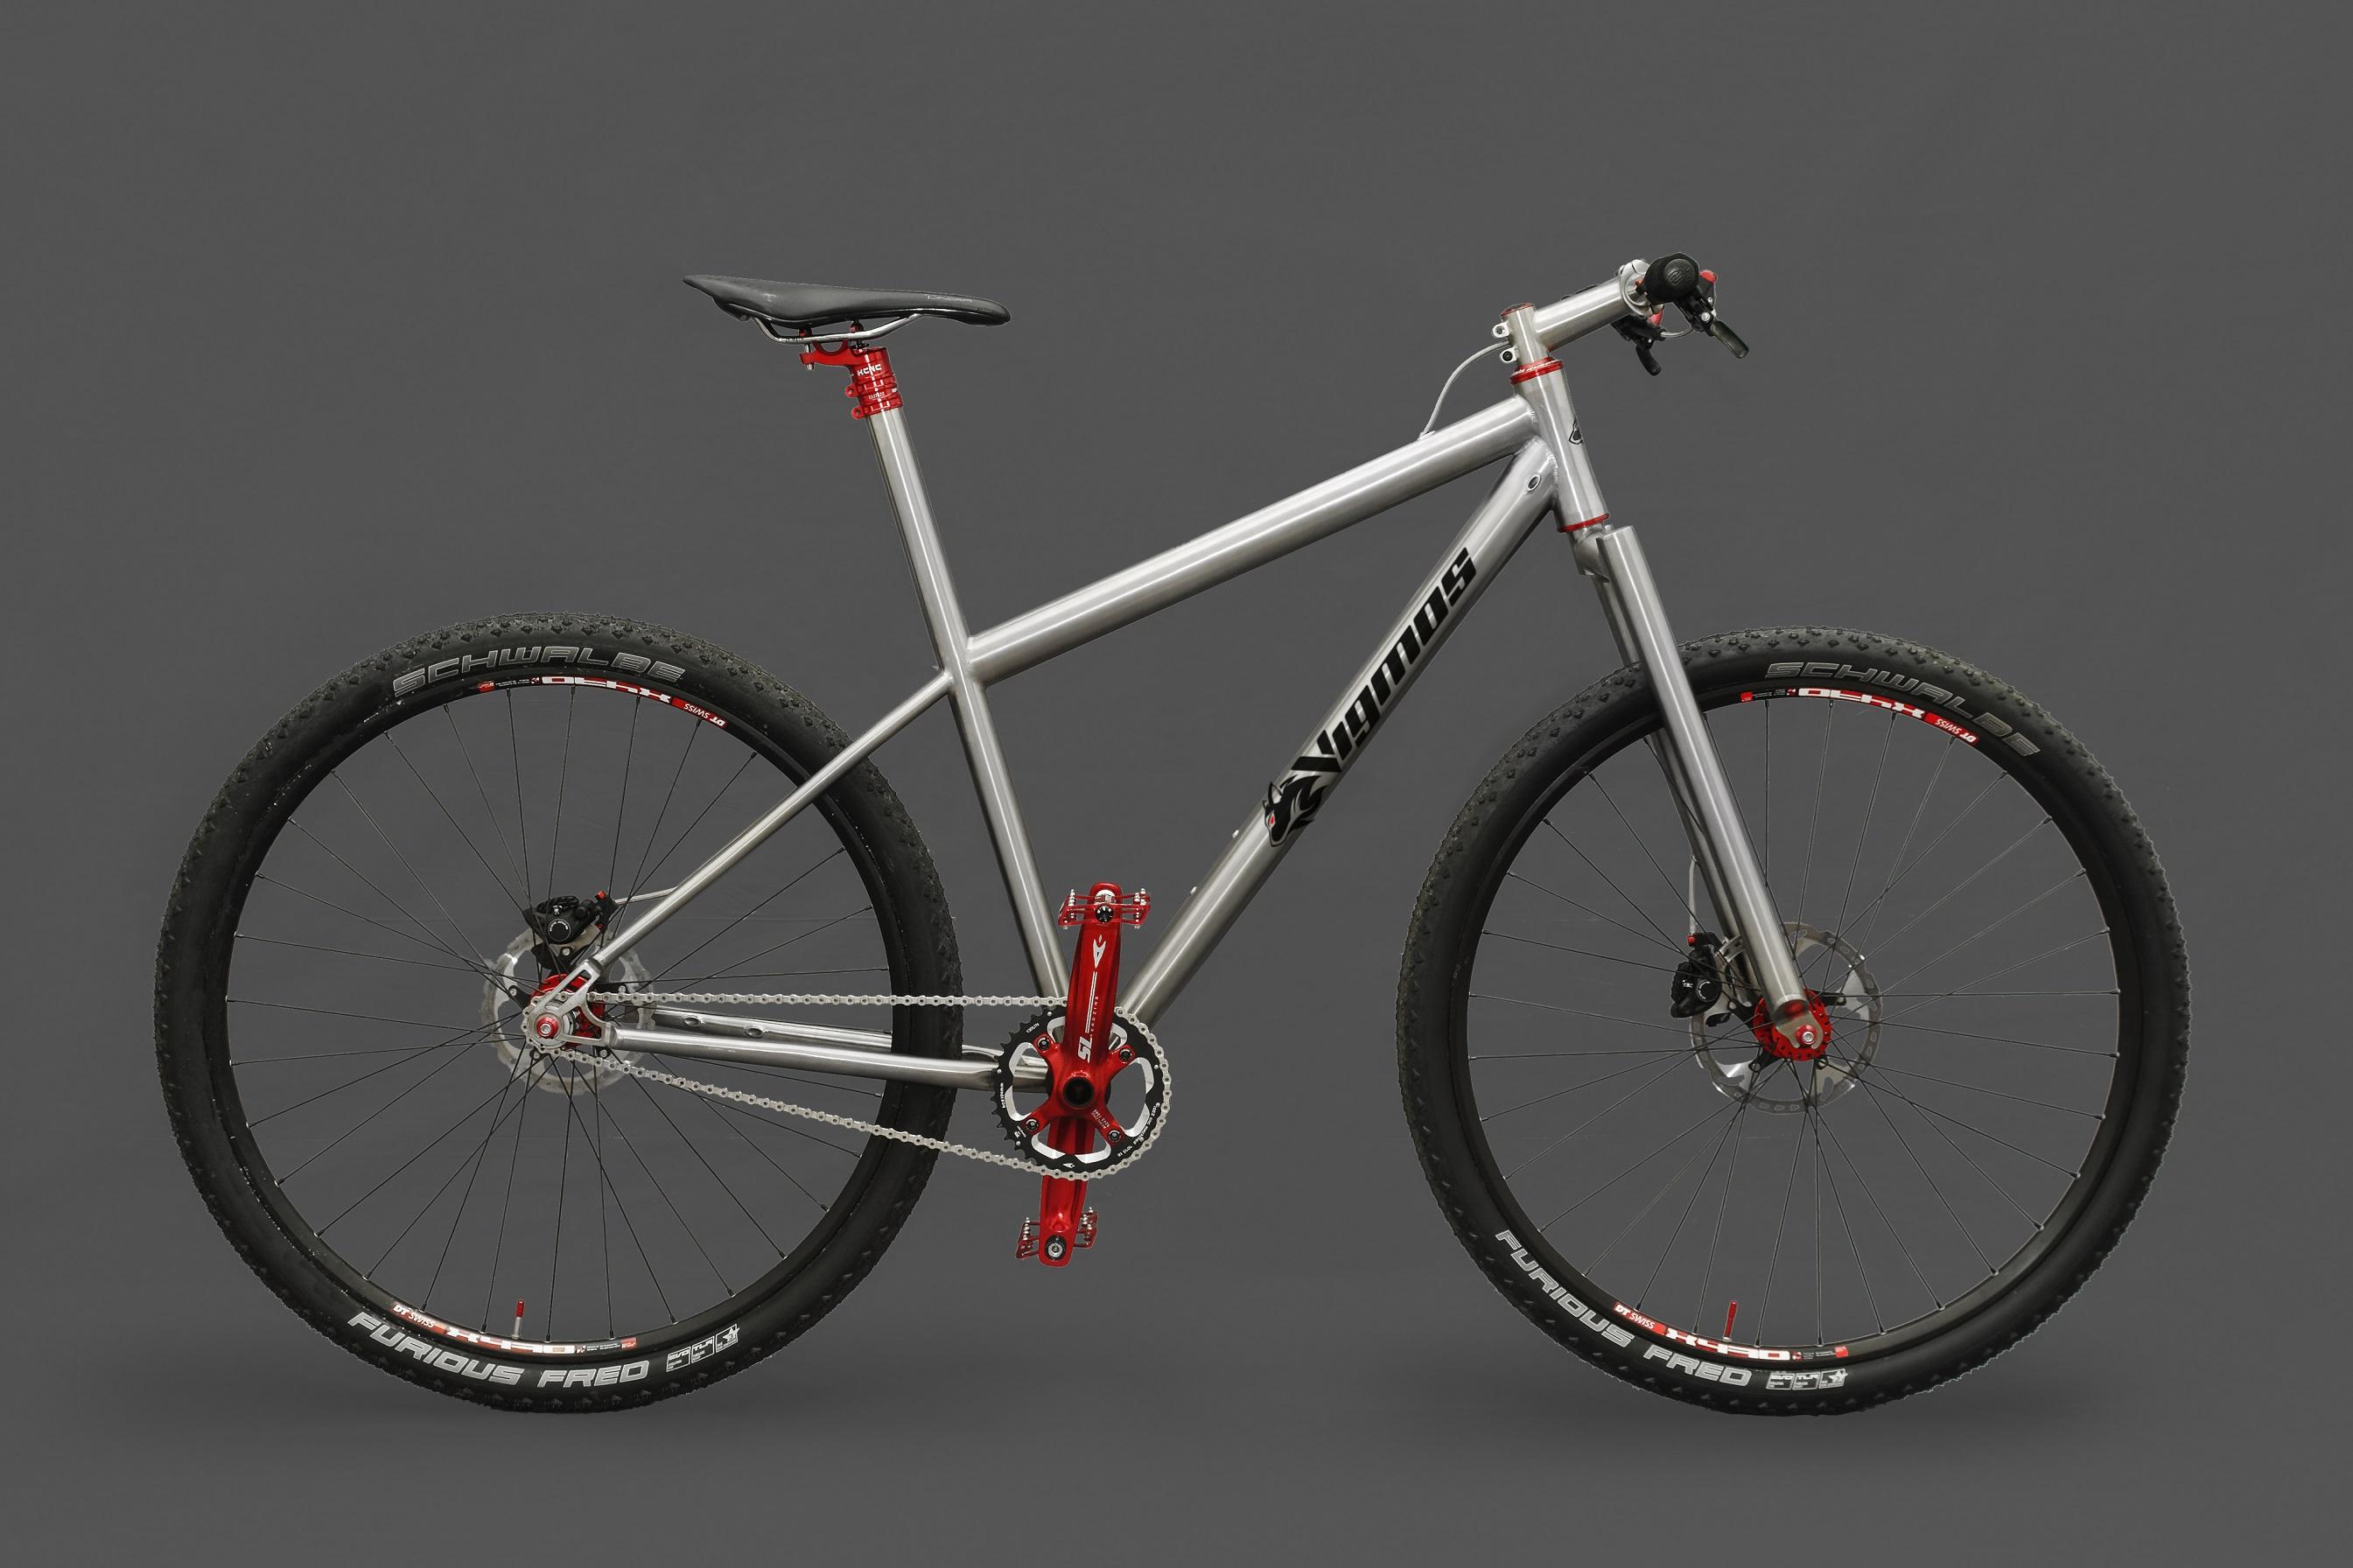 29er Titanrad Erlkönig titanium bike - Individueller Fahrradbau ...